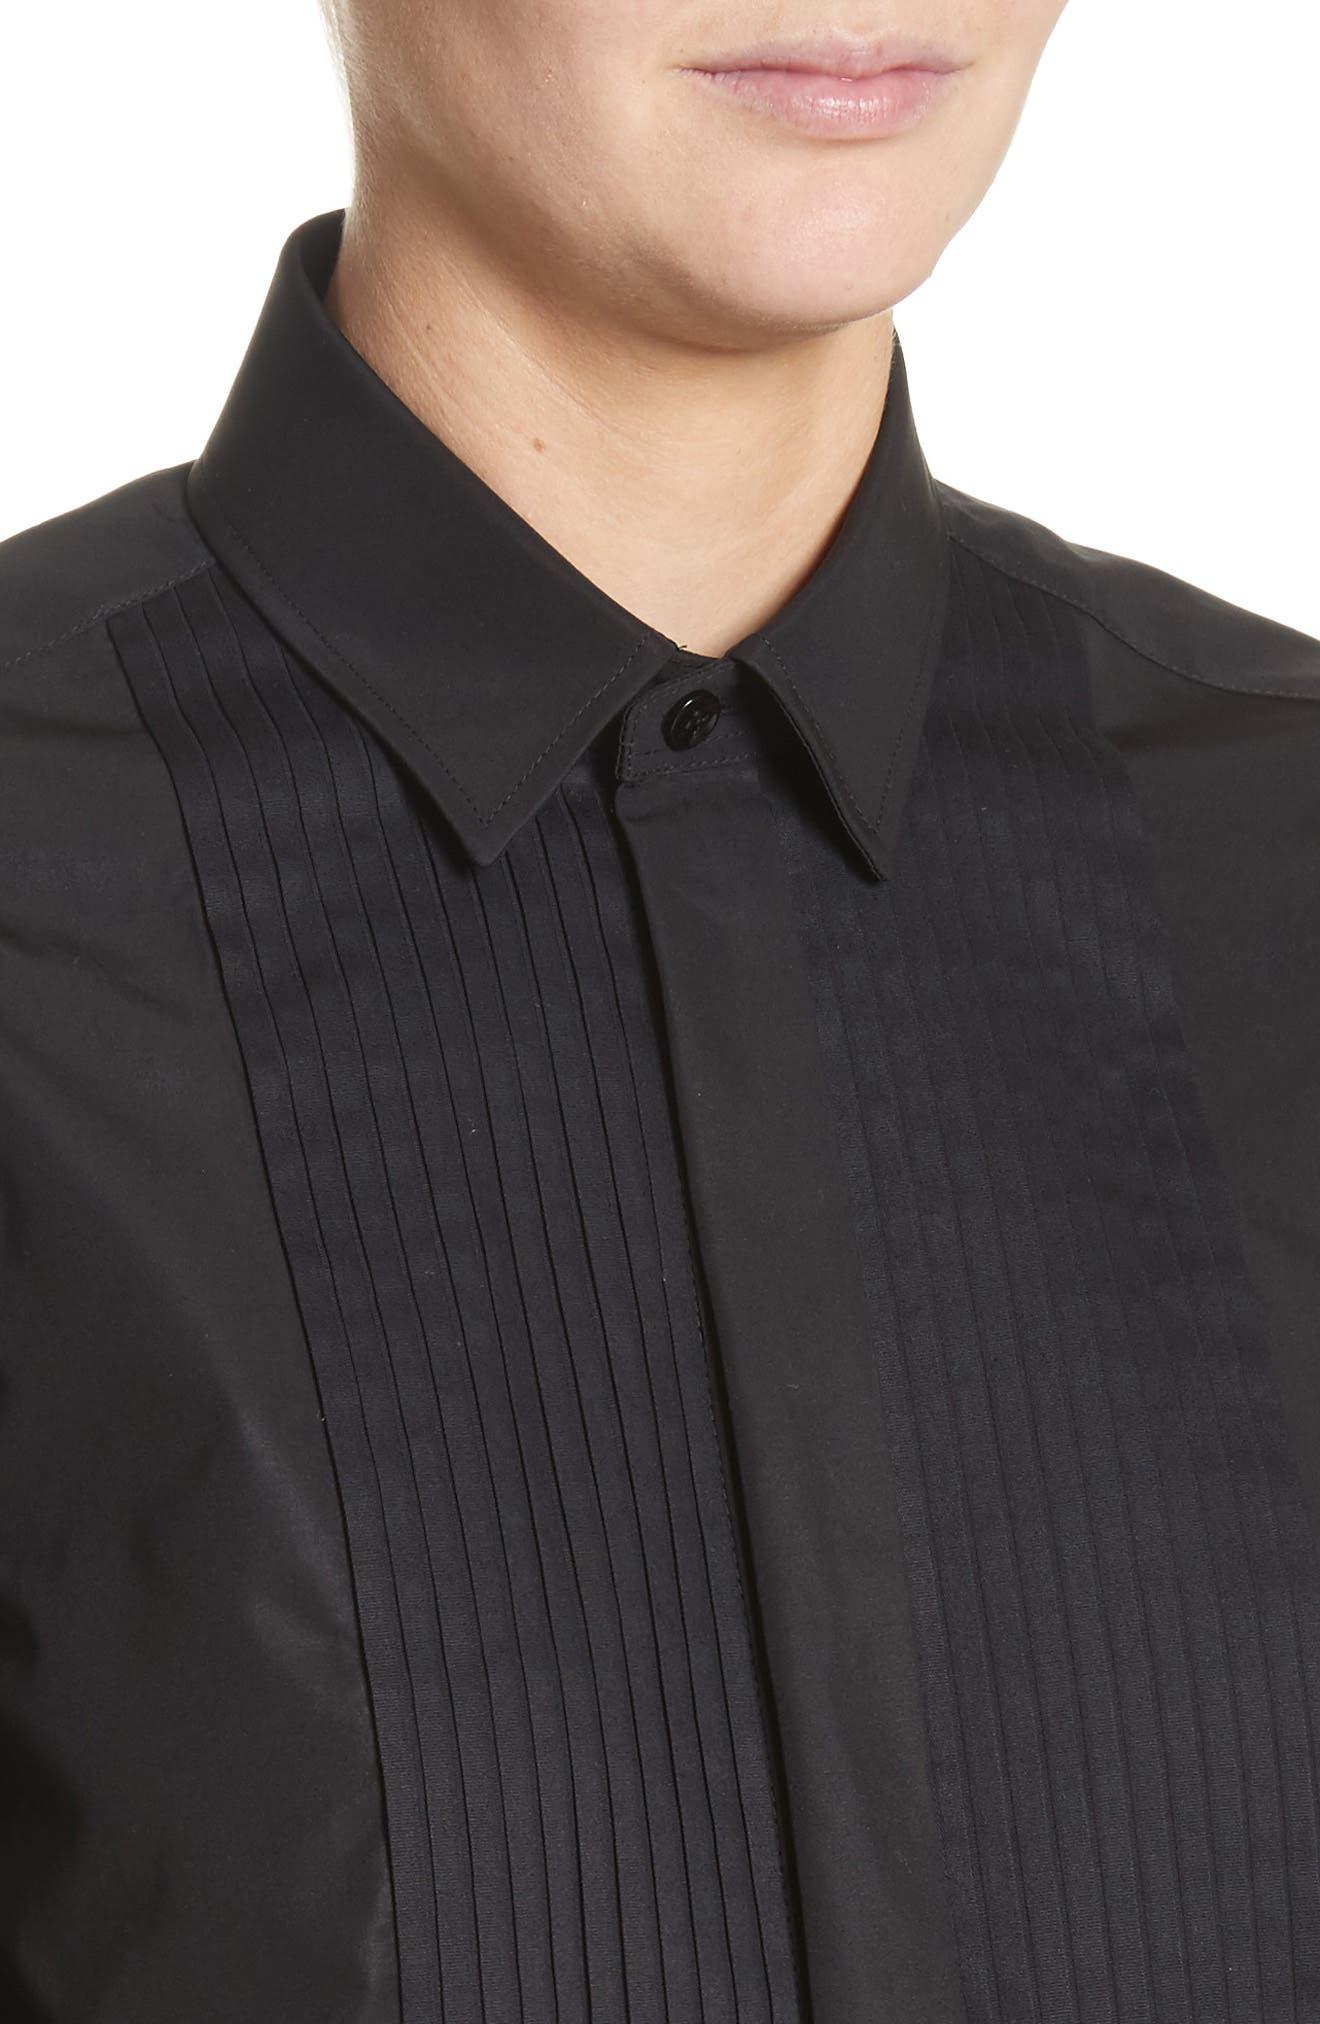 Alternate Image 4  - Saint Laurent Cotton Tuxedo Shirt